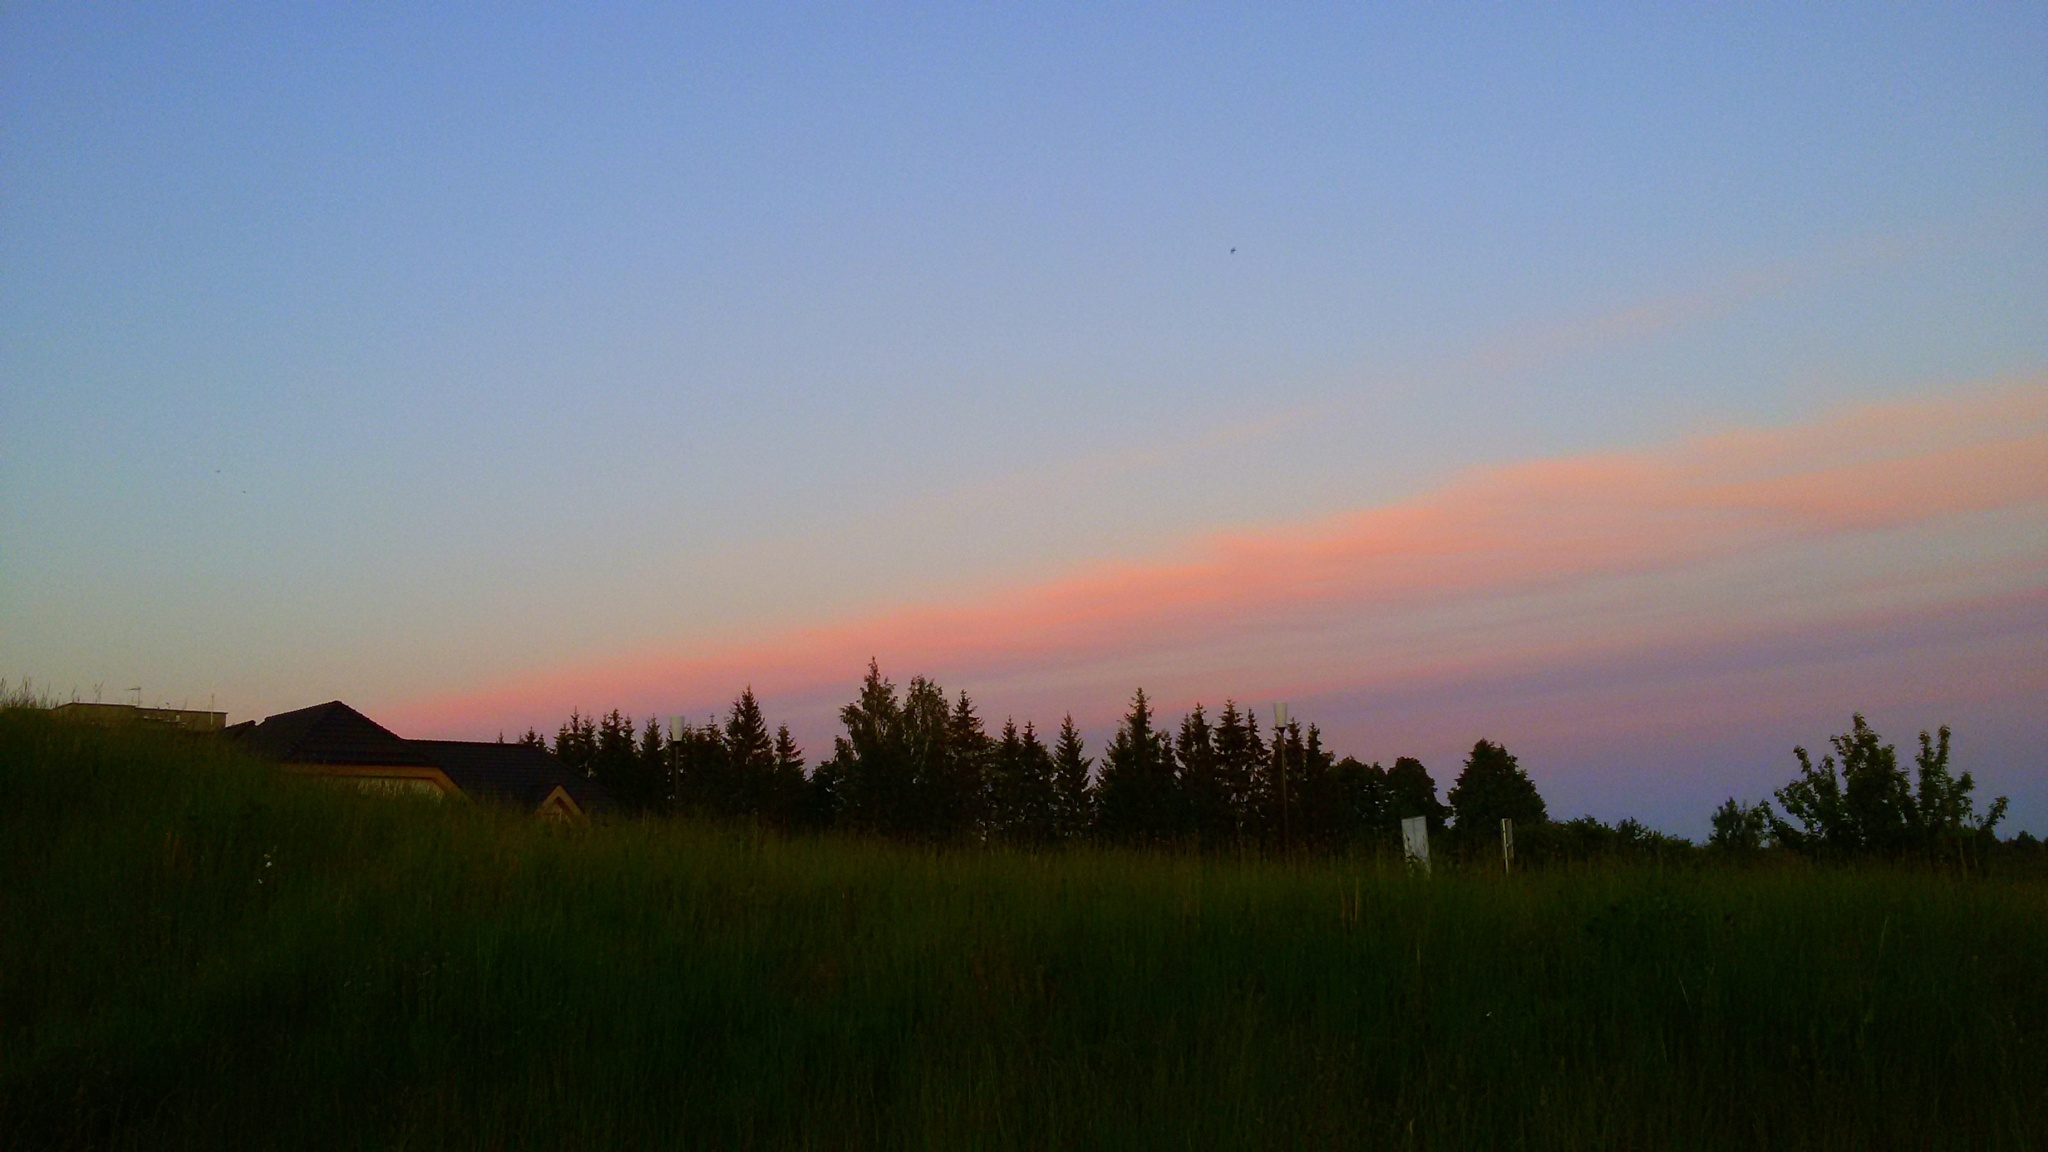 Colored sky by uzkuraitiene62